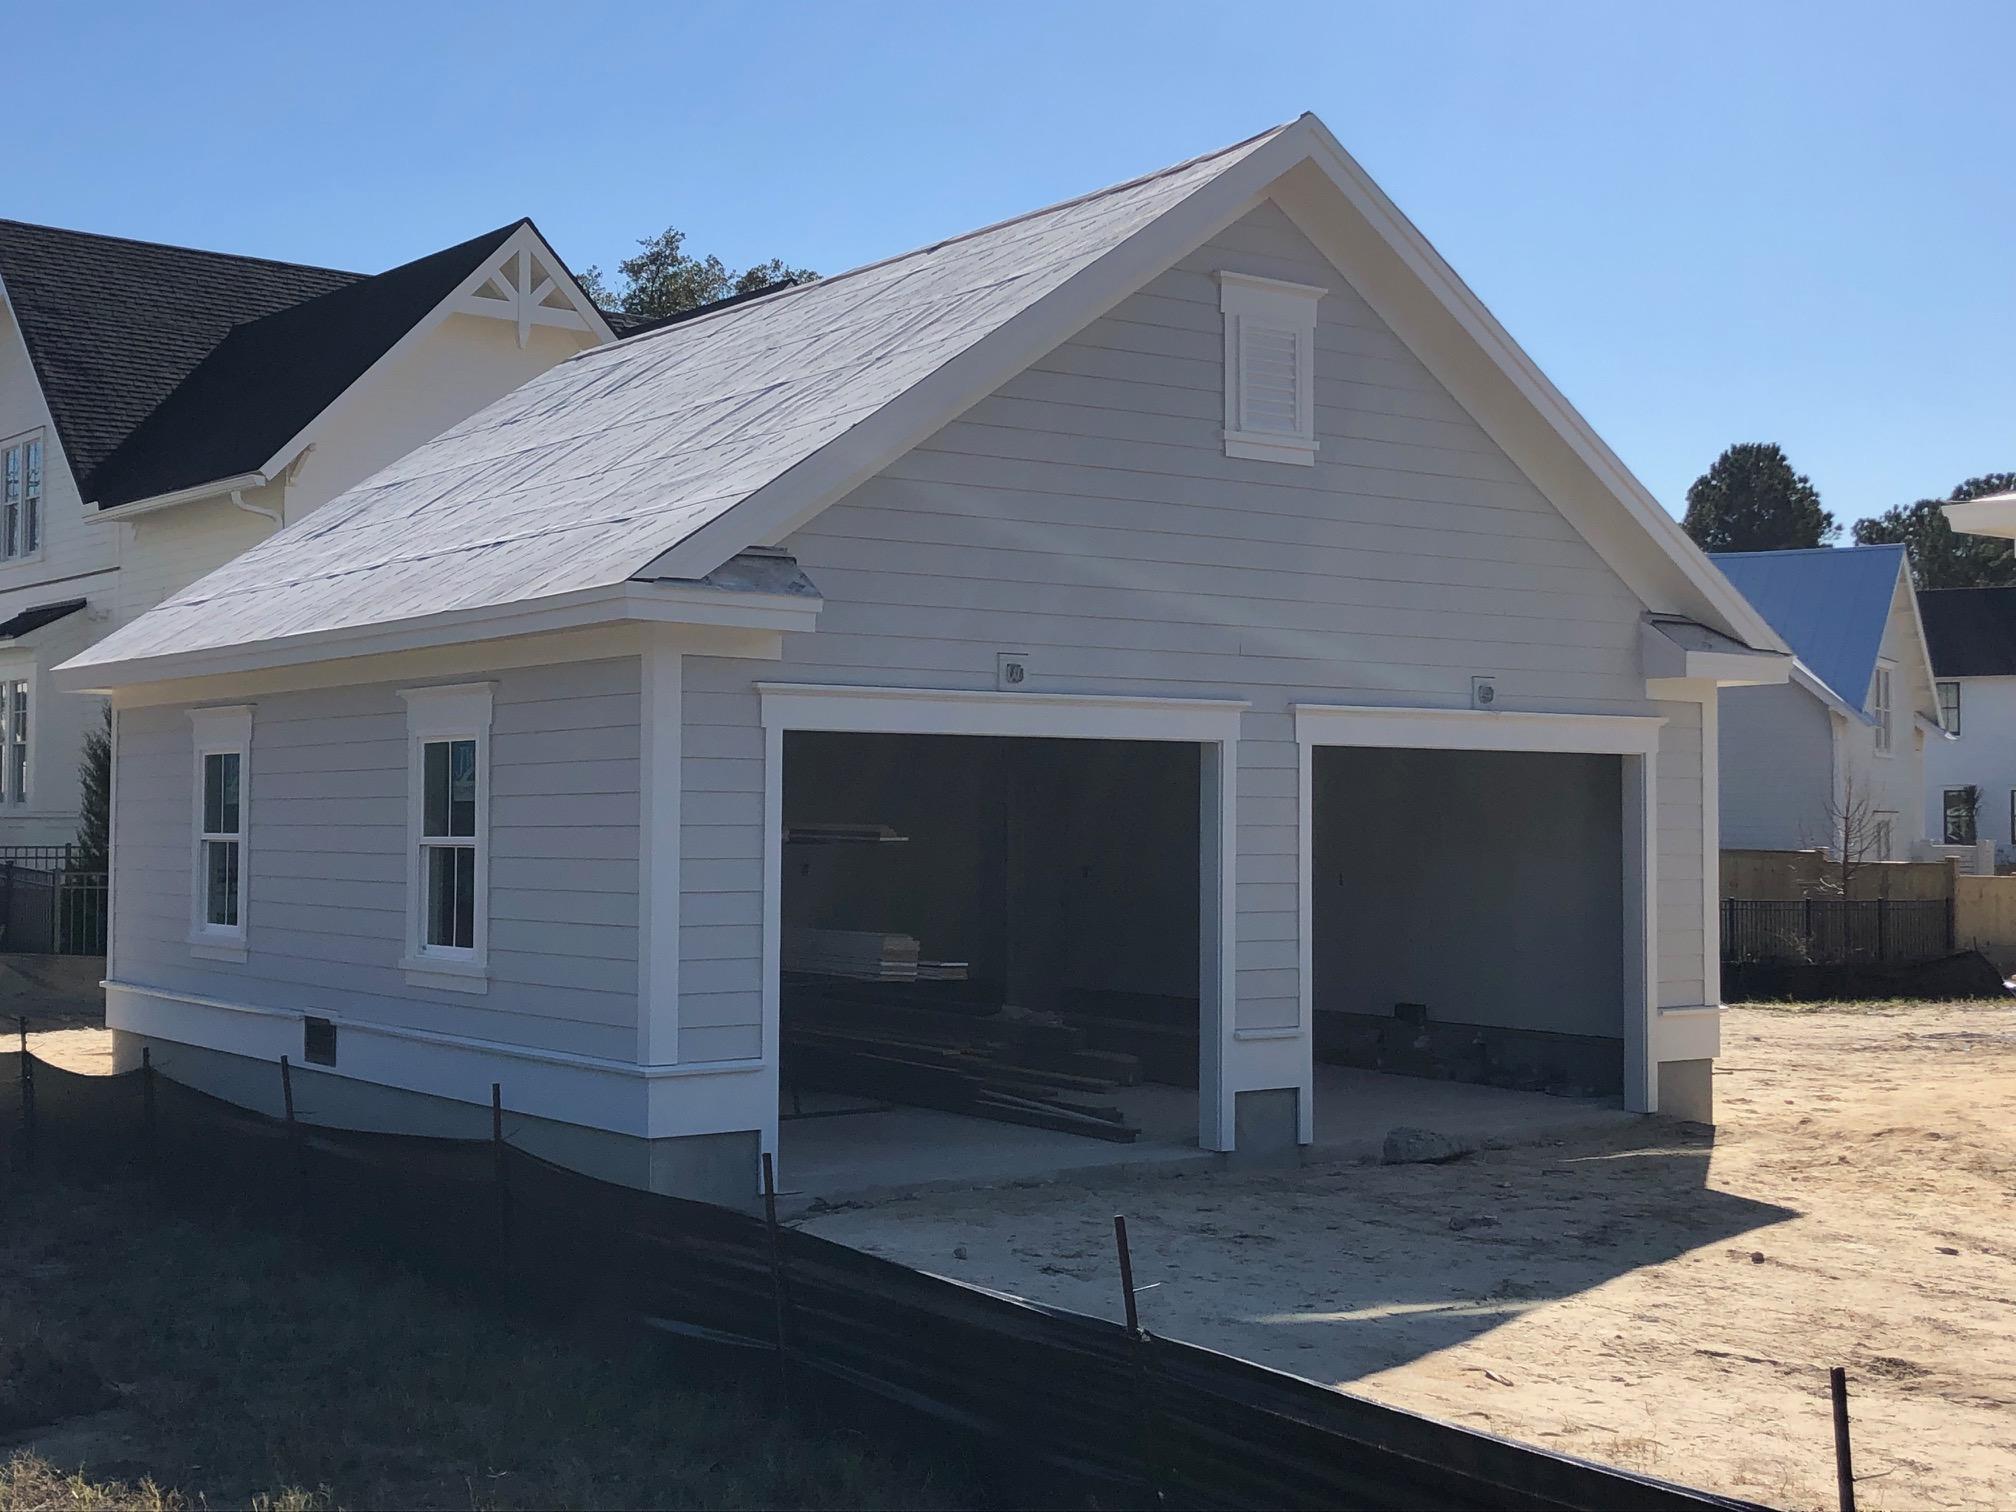 Daniel Island Homes For Sale - 532 Lesesne, Charleston, SC - 8